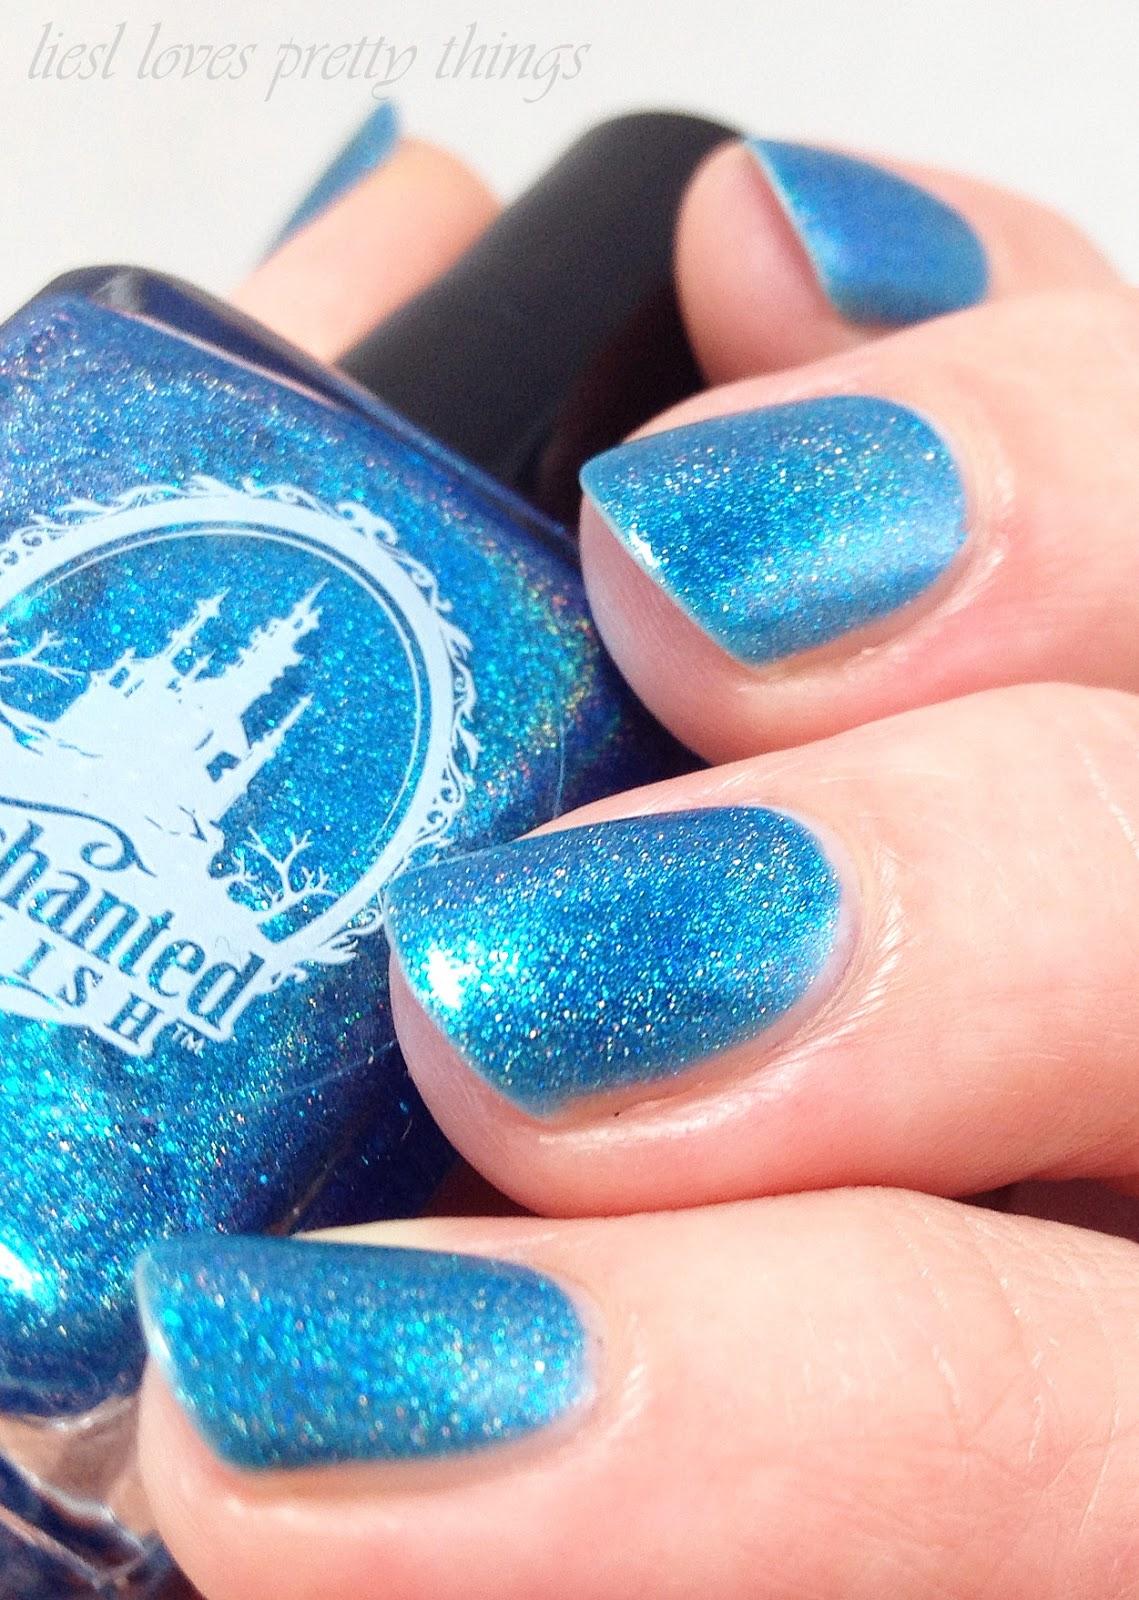 Enchanted Polish December 2014